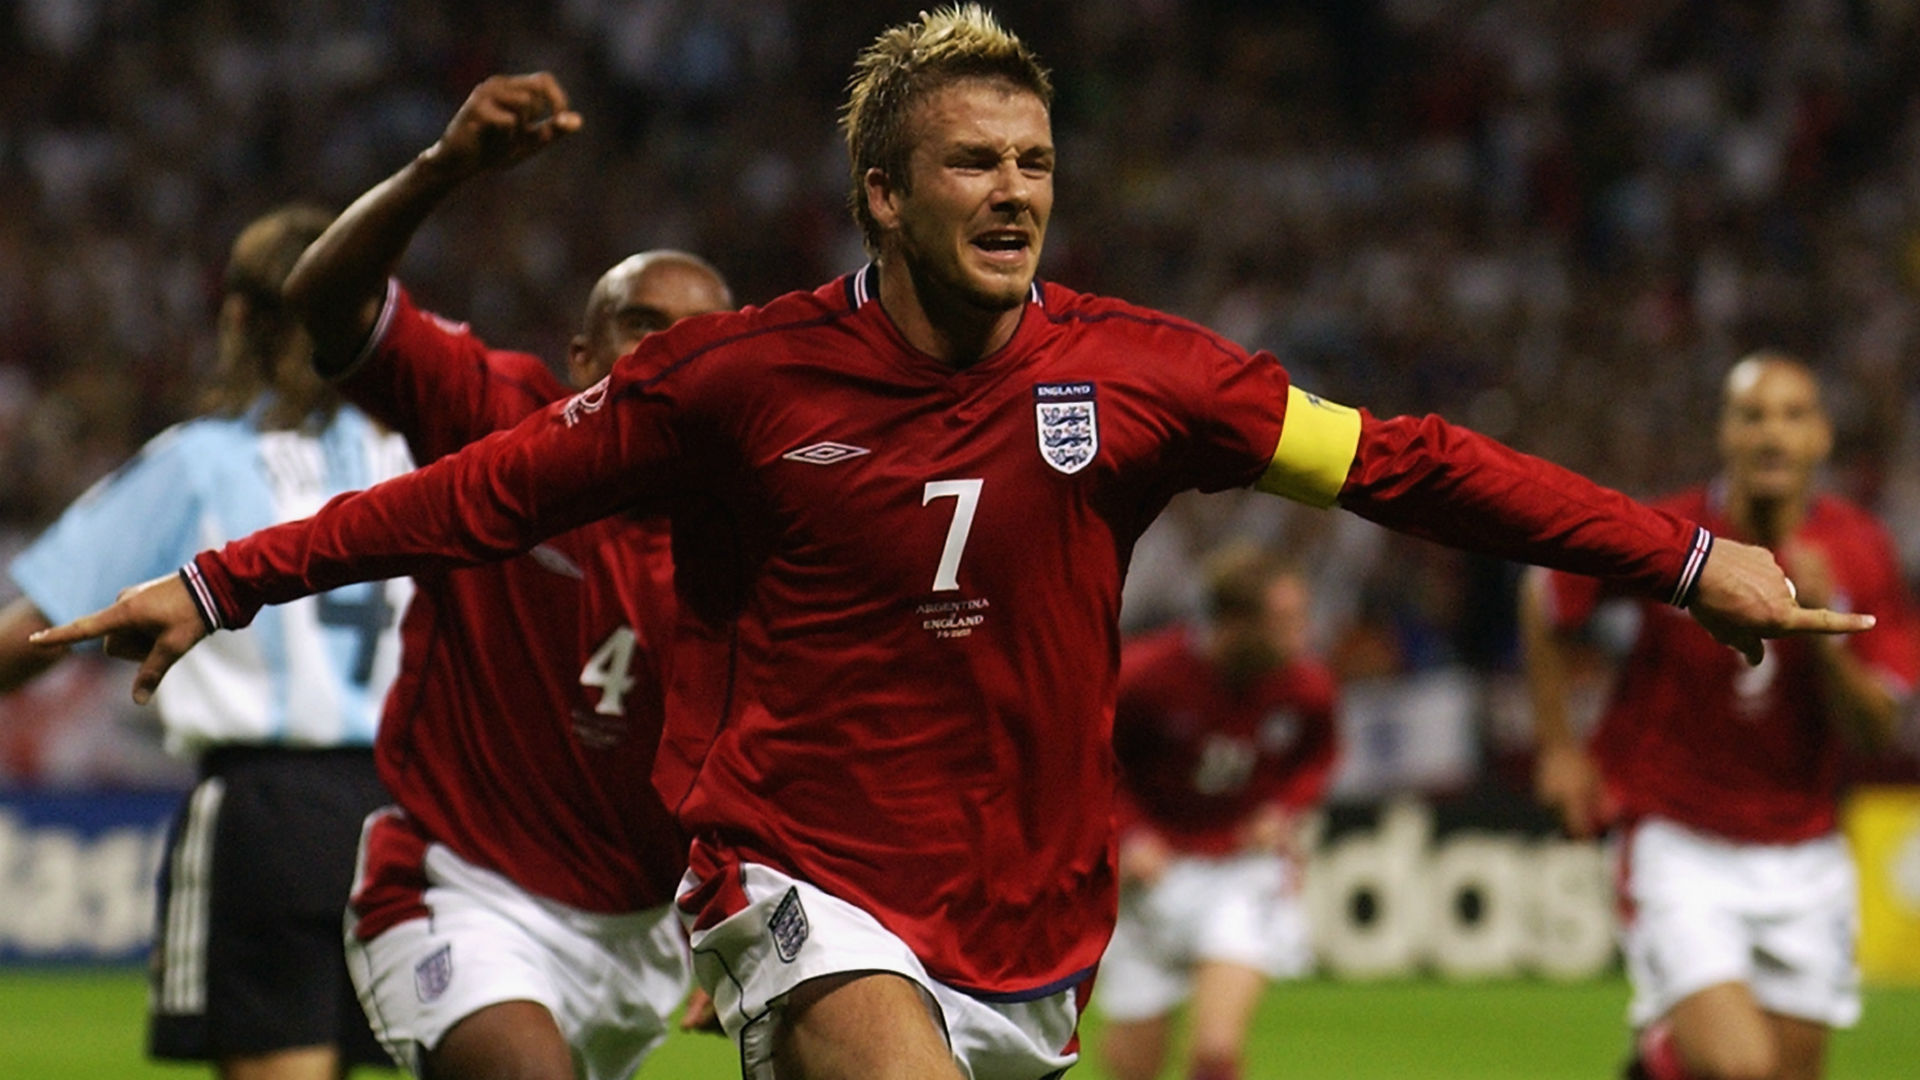 David Beckham Goal Celebration David Beckham V Argentina Uopsghzqziqrlwierj